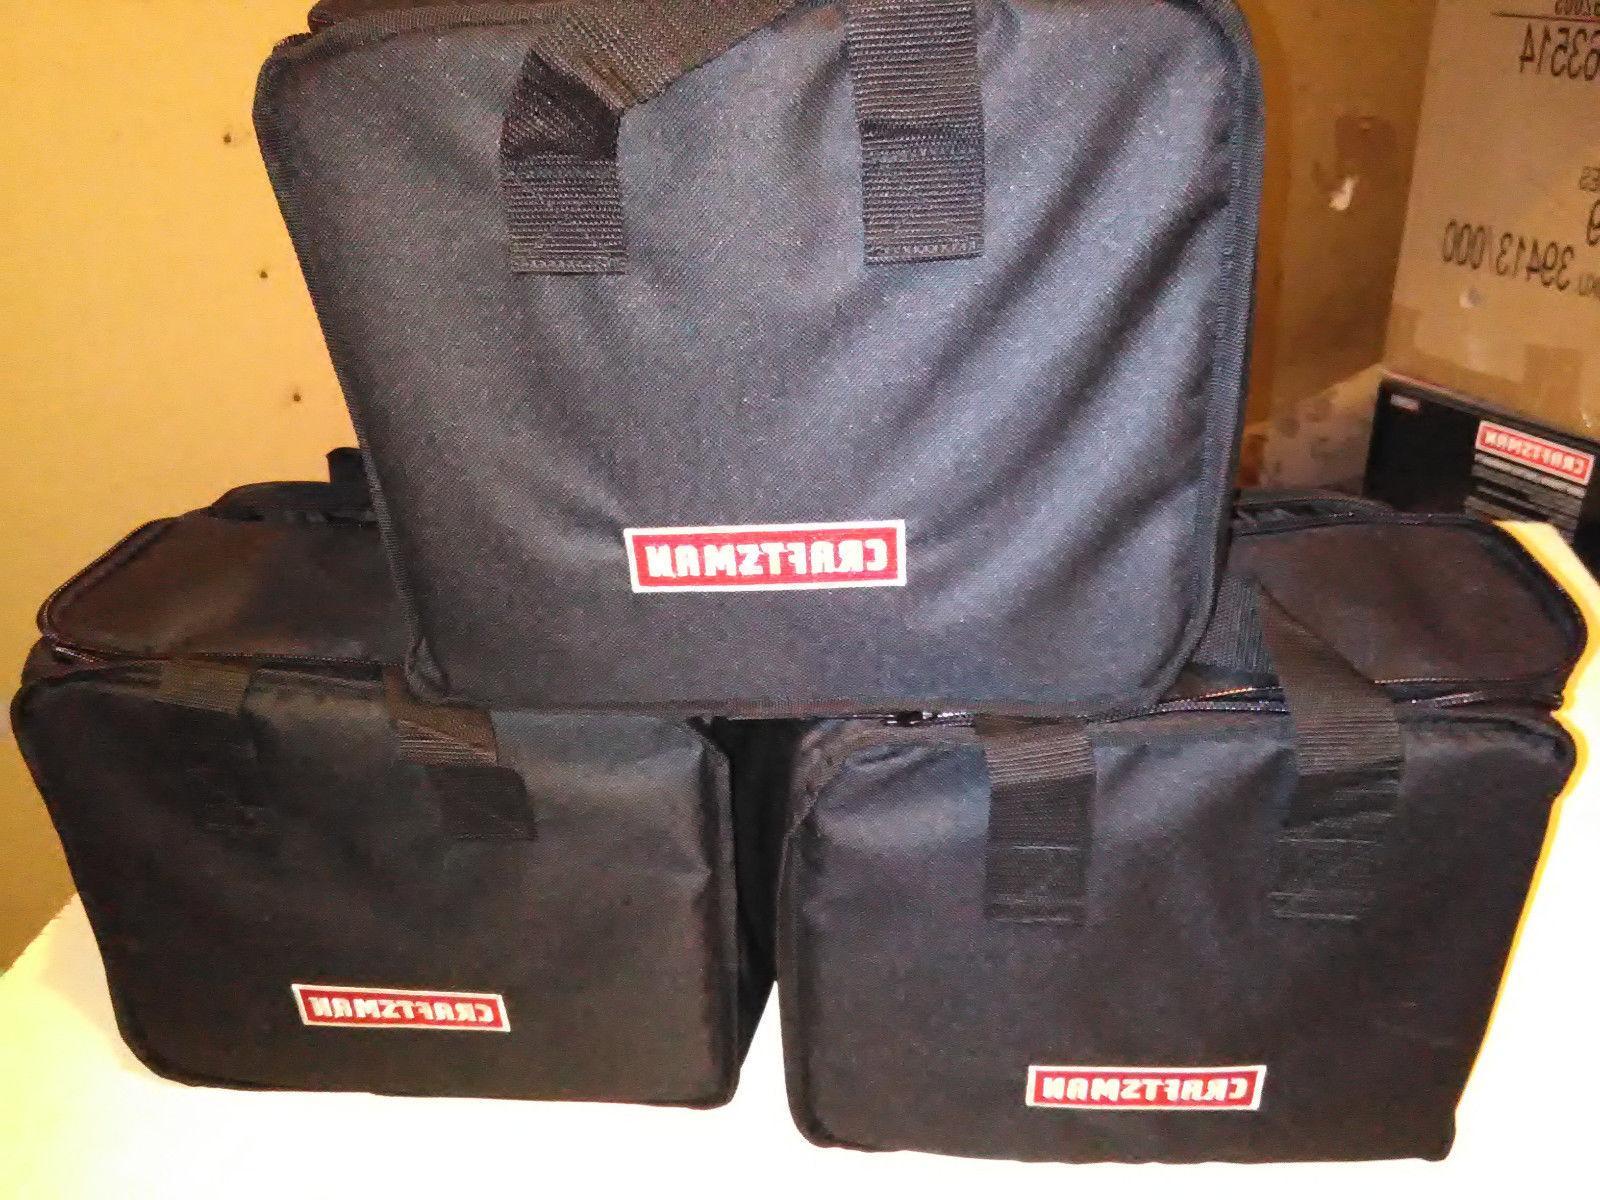 *NEW* LOT OF 3 Craftsman 19.2v C3 Cordless Drill Tool Bag 12